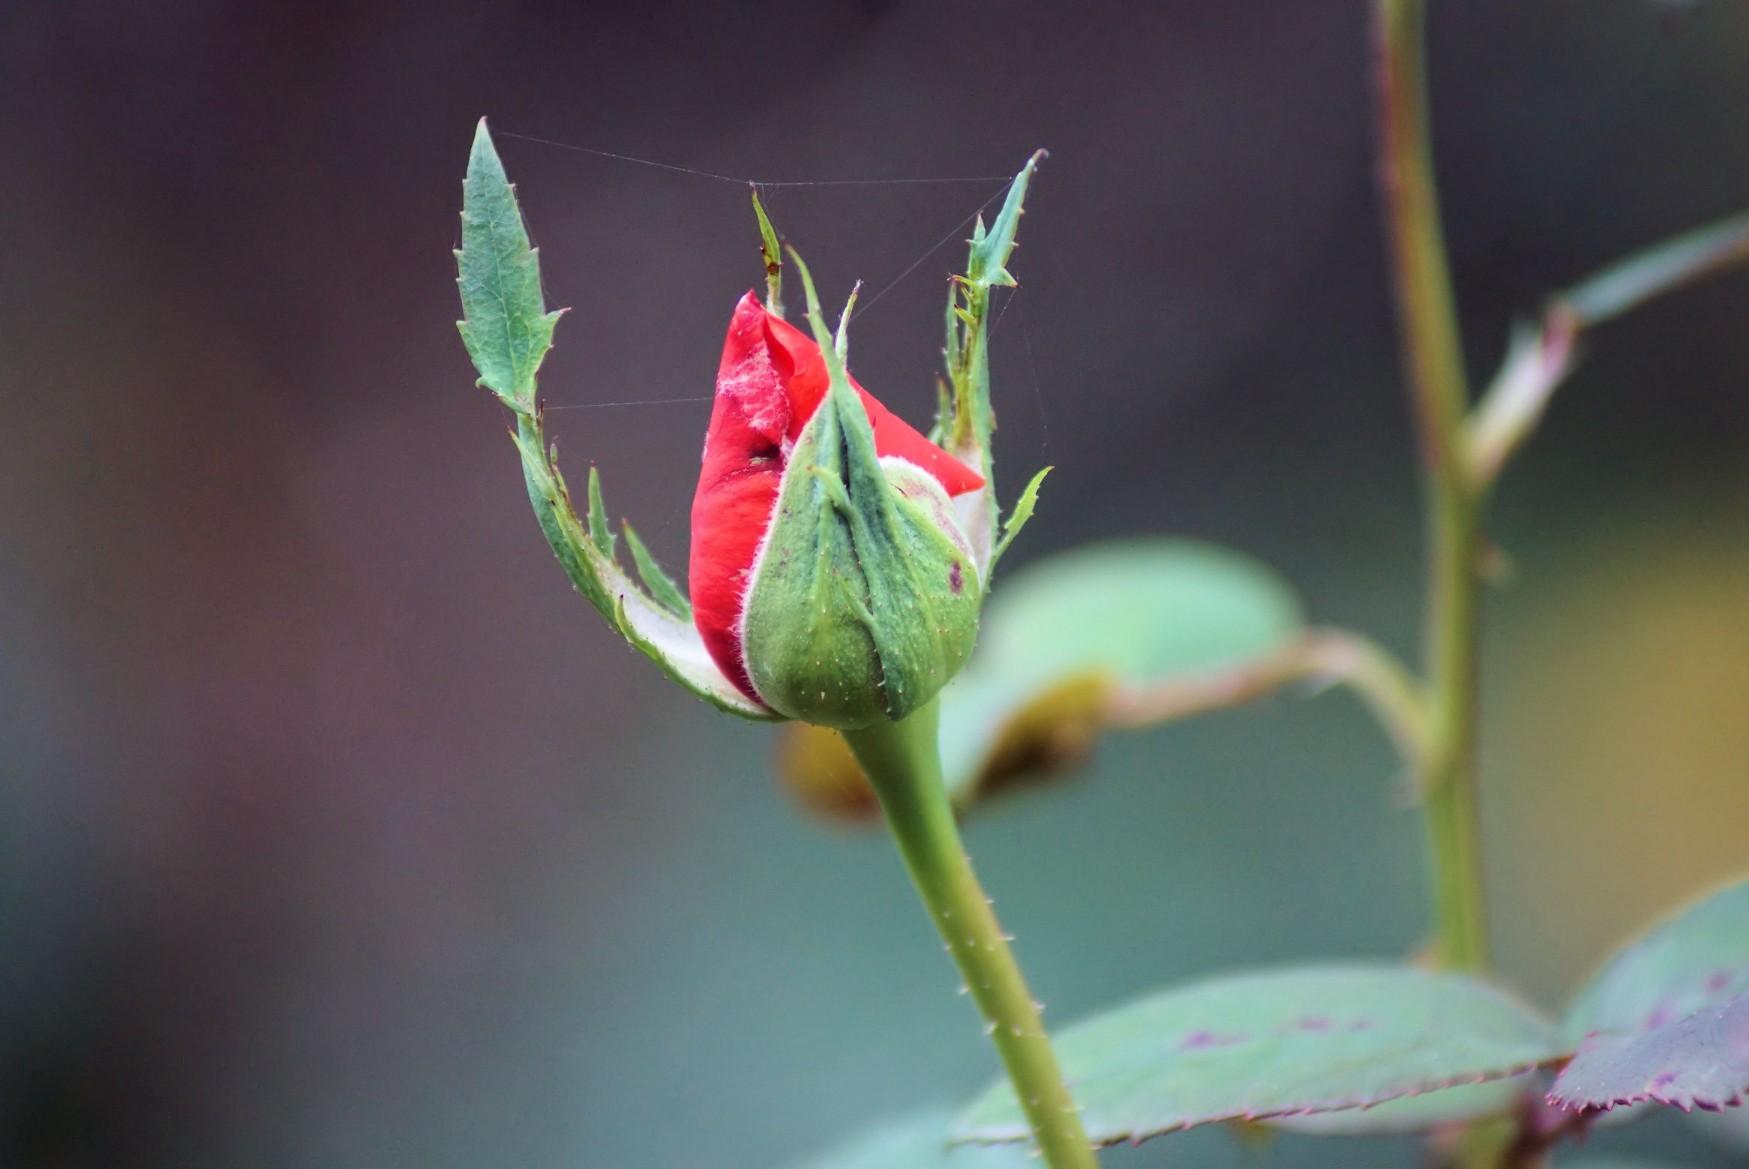 rose_2019.jpg